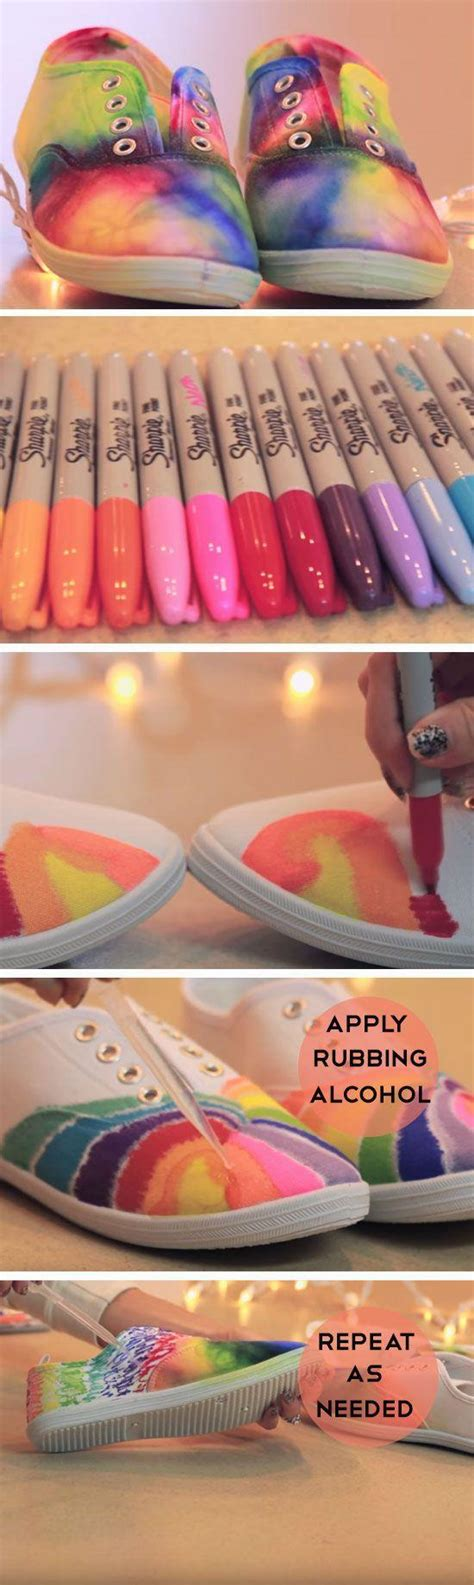 easy summer crafts for diy 23 easy summer crafts for to make 2540741